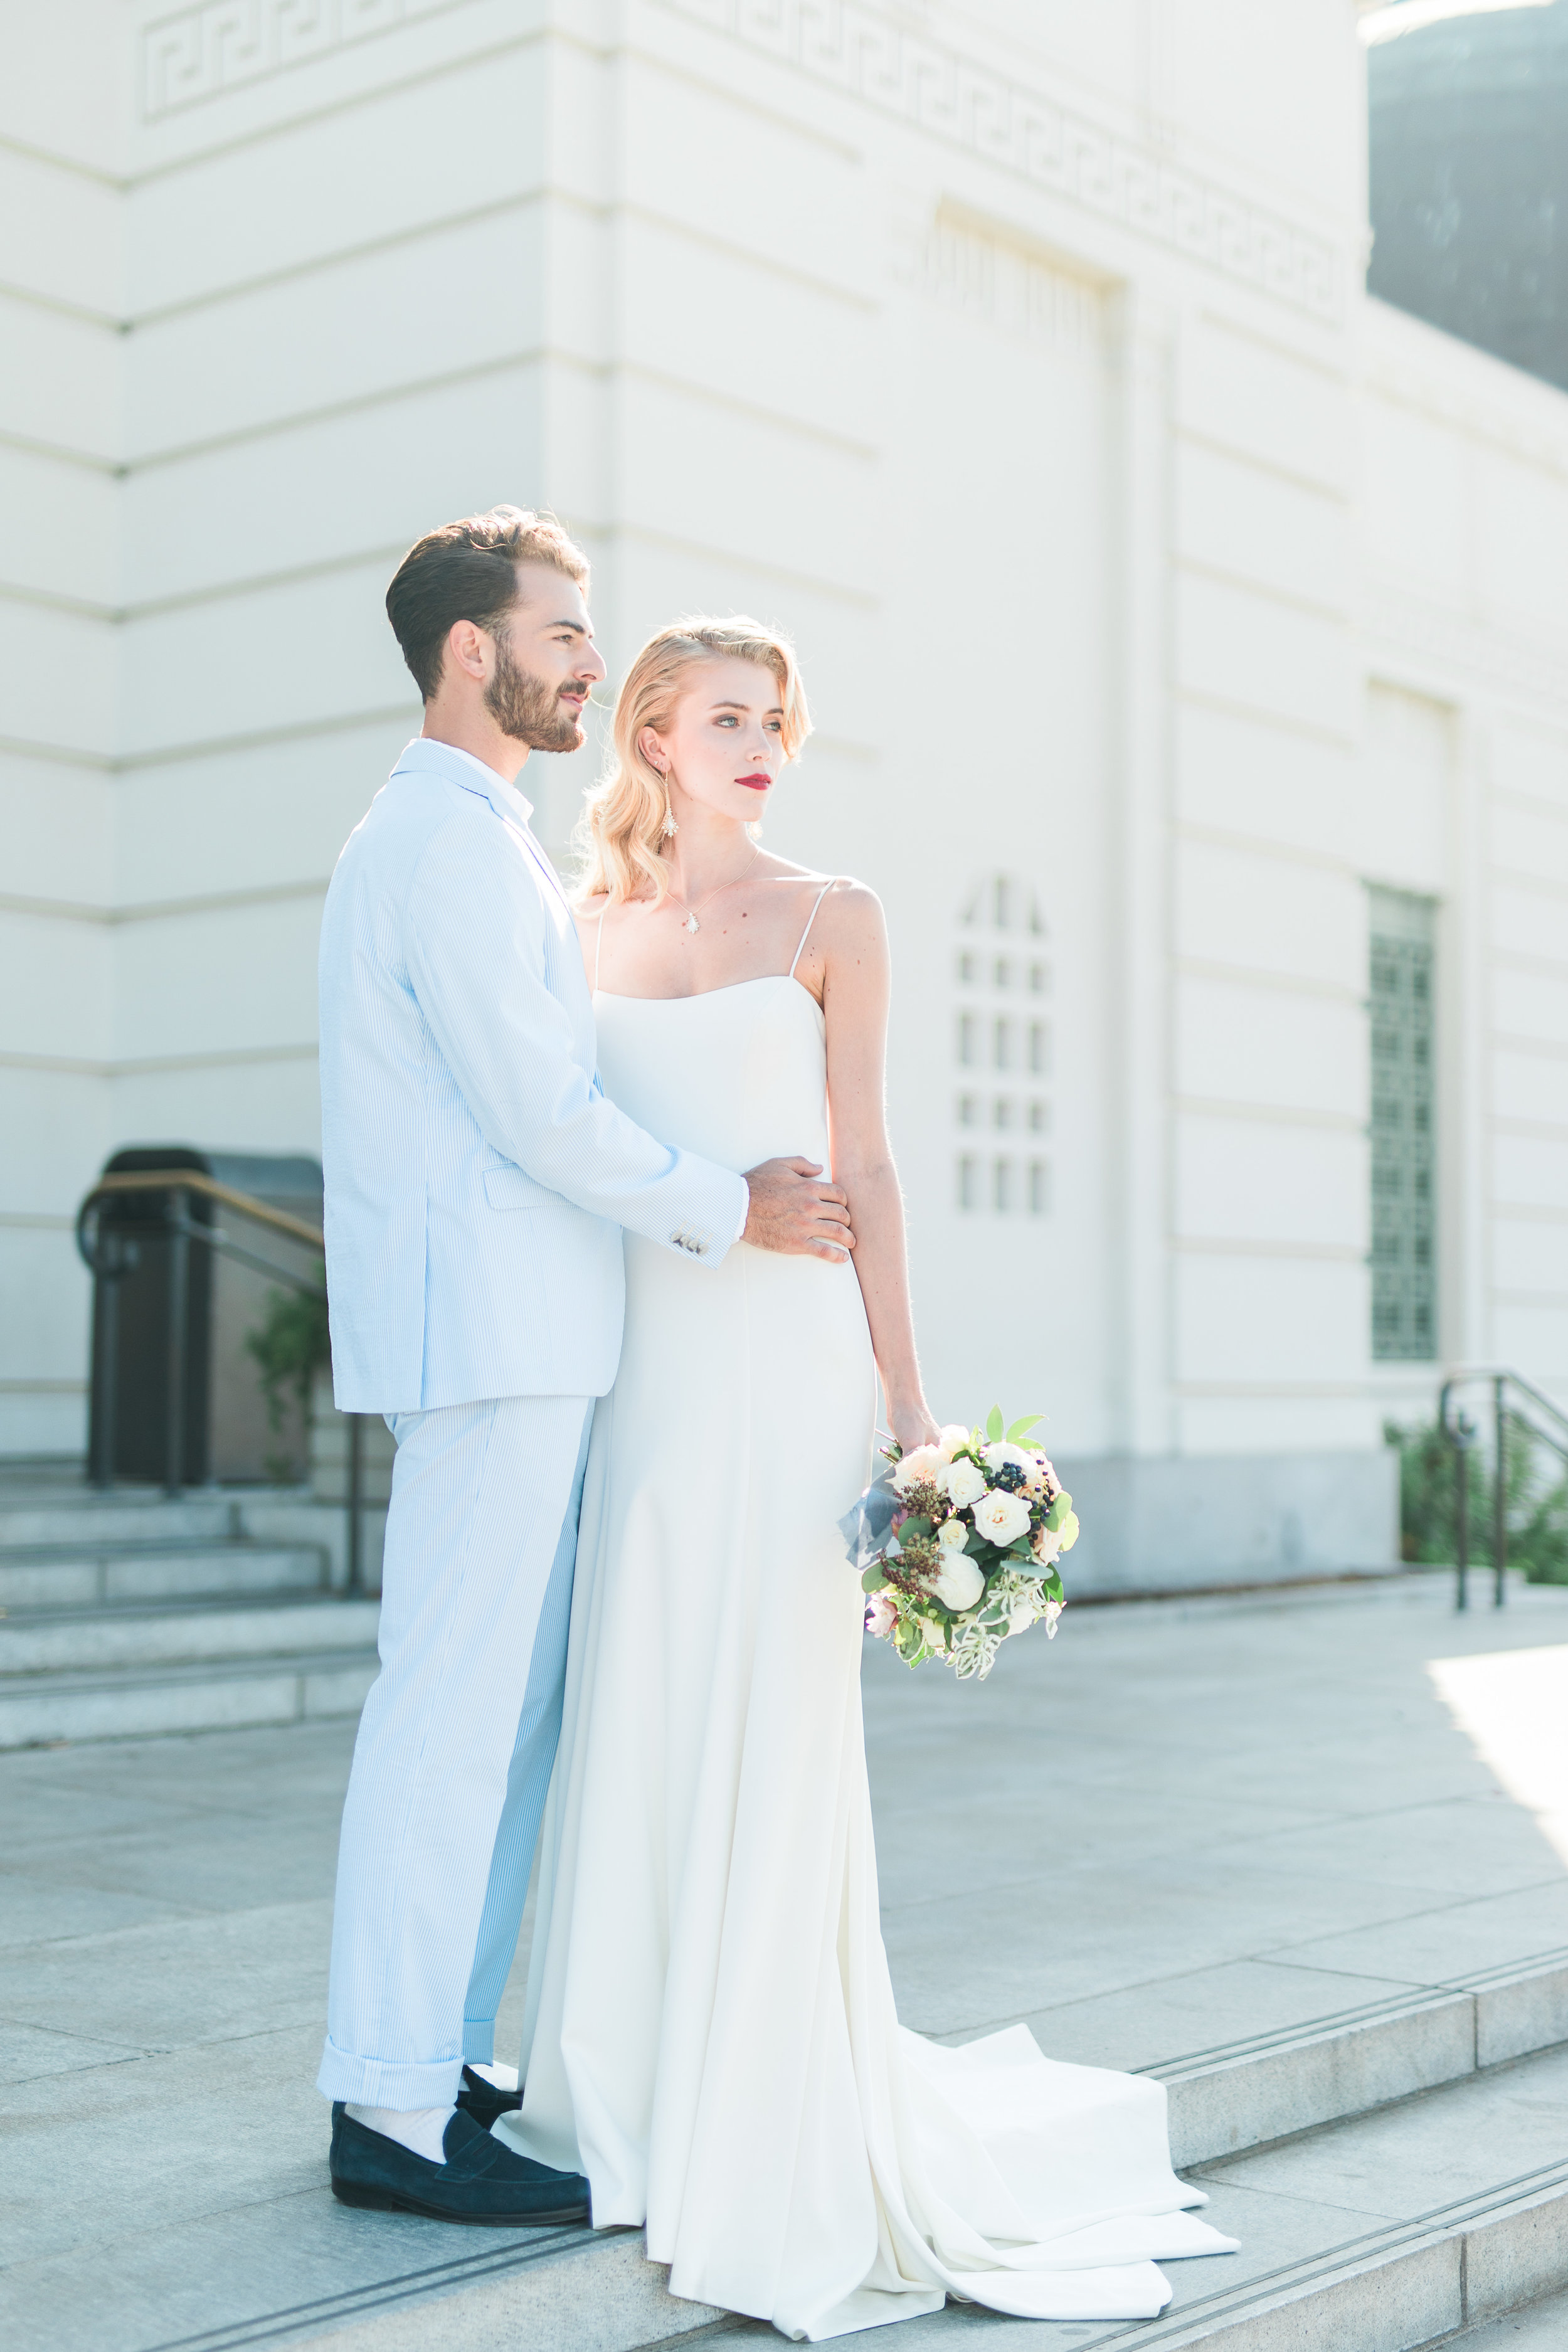 LA-Wedding-Shoot-by-JBJ-Pictures-26.jpg